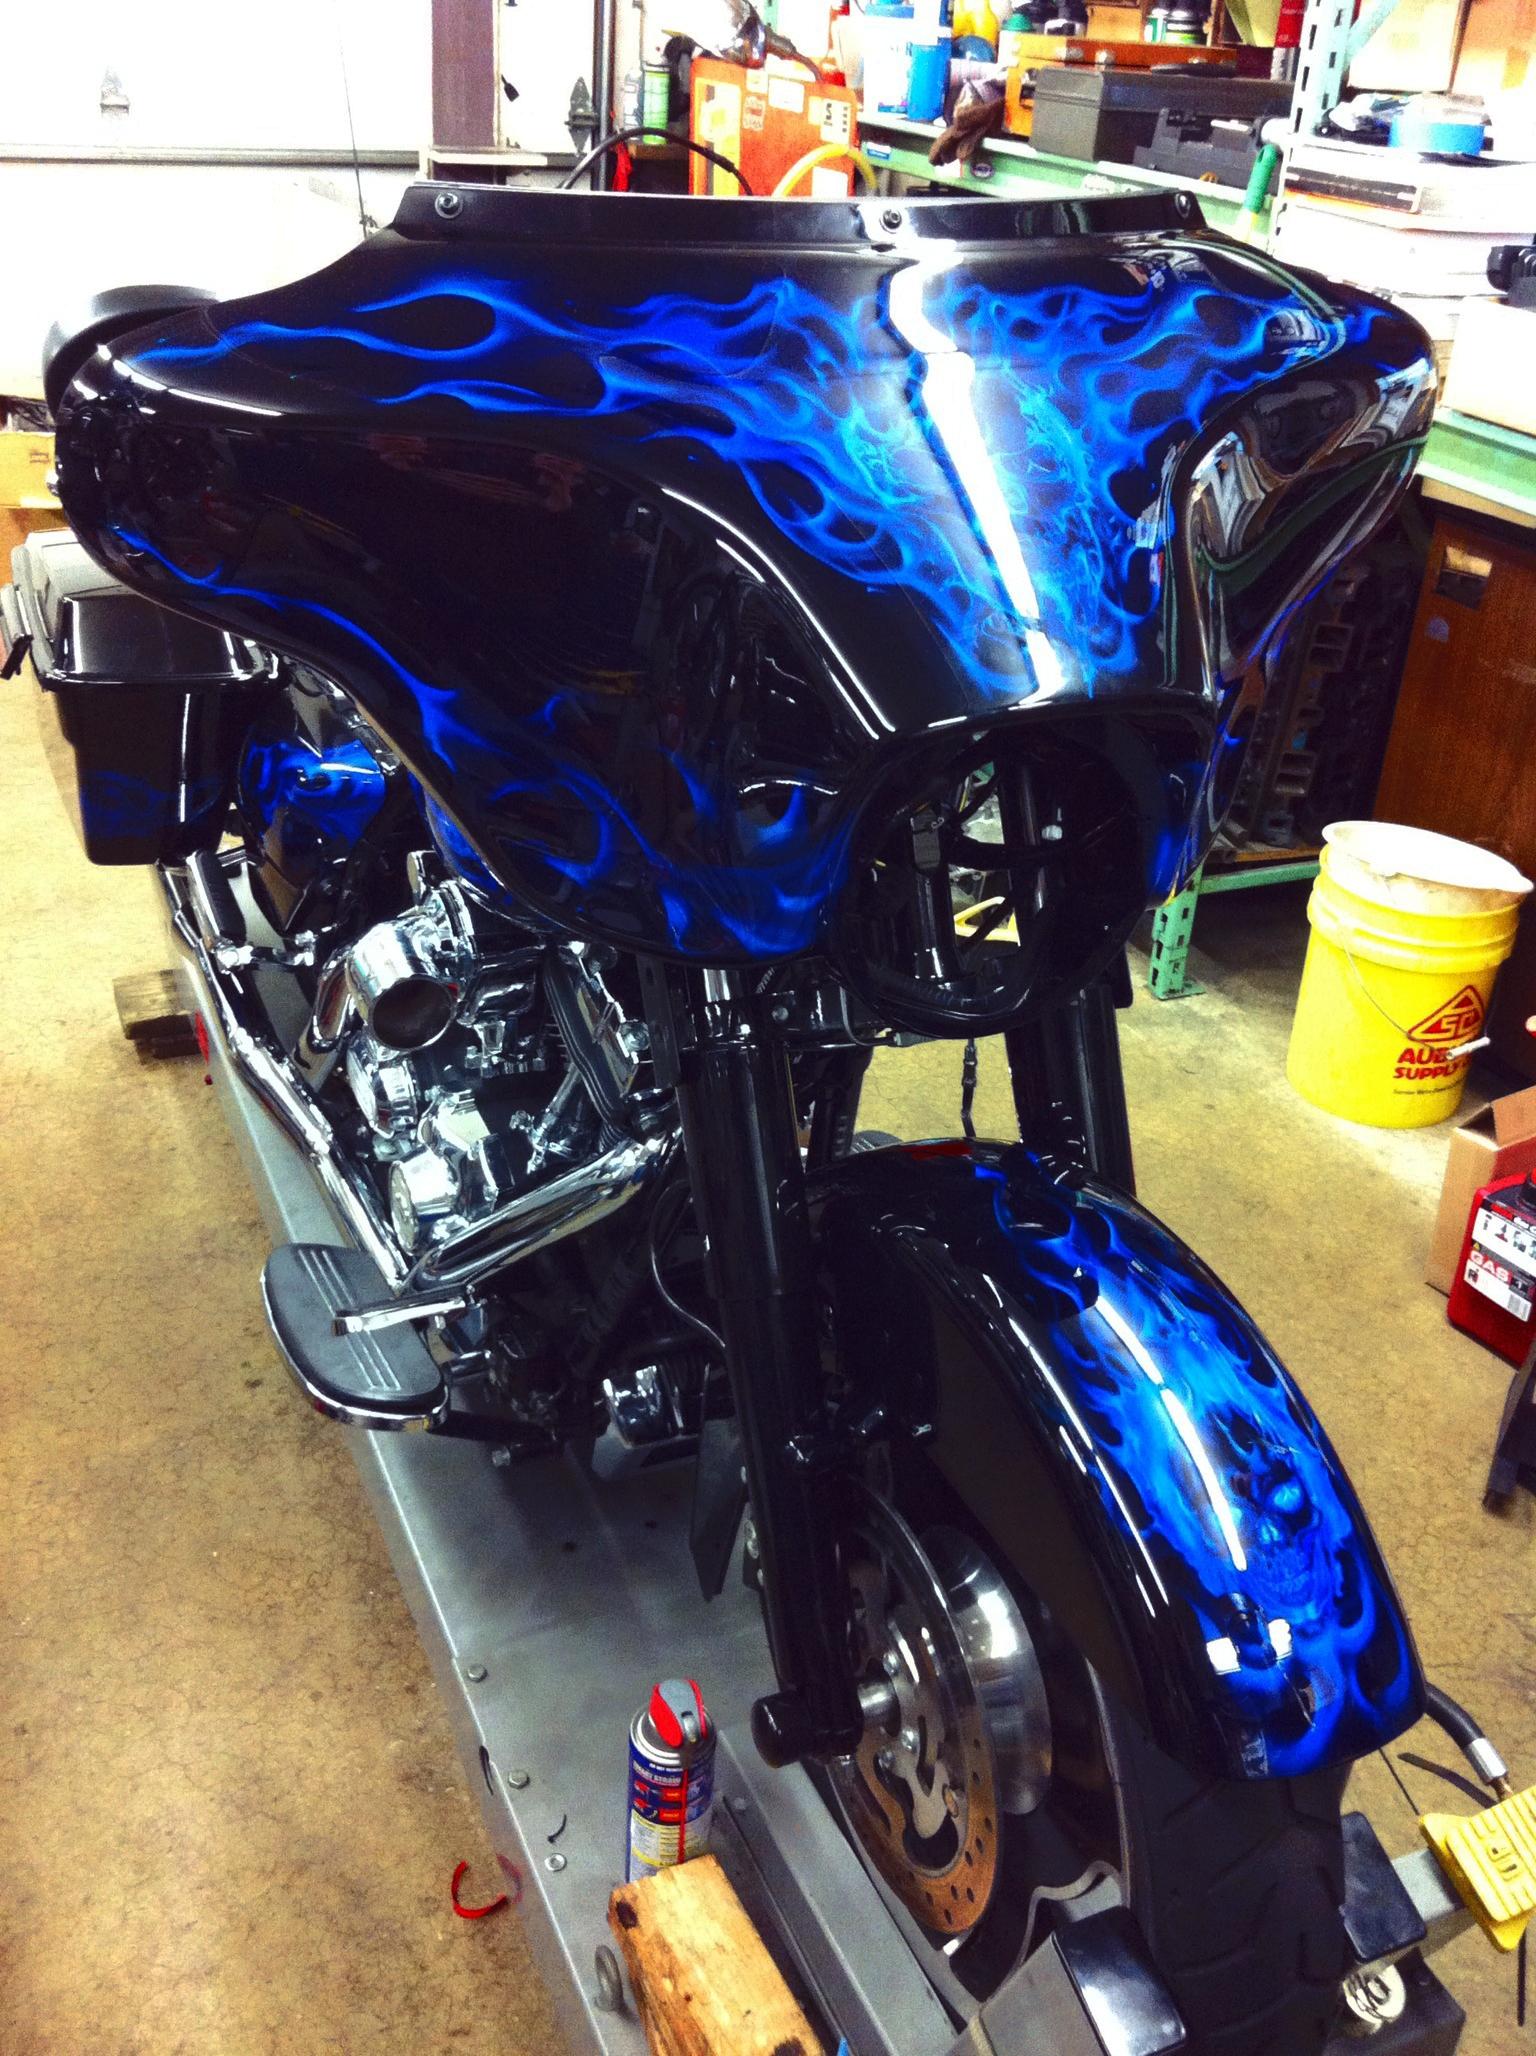 Custom Bagger Motorcycle Paint Jobs Wonderful Custom Bagger Paint